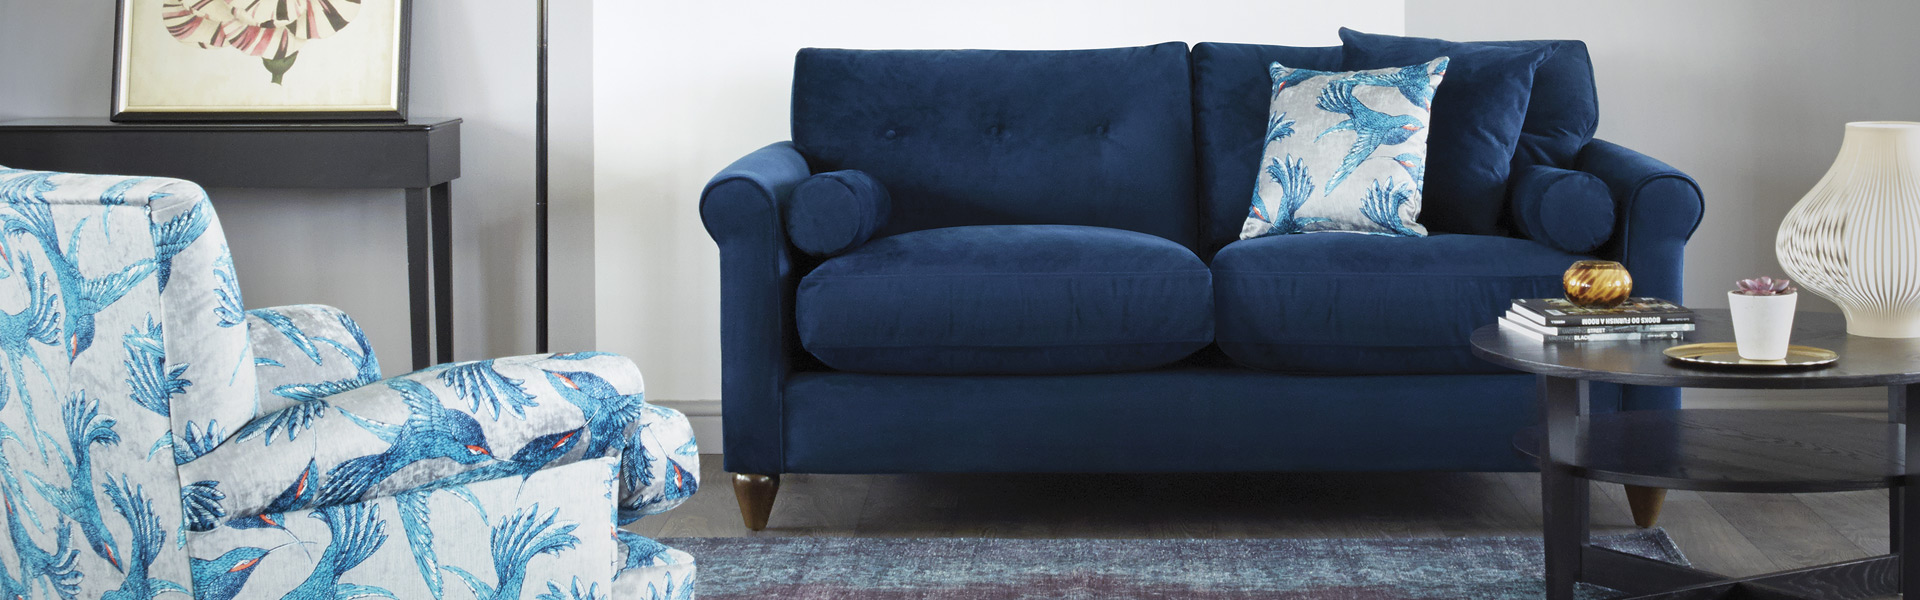 Phoebe Classic Sofa